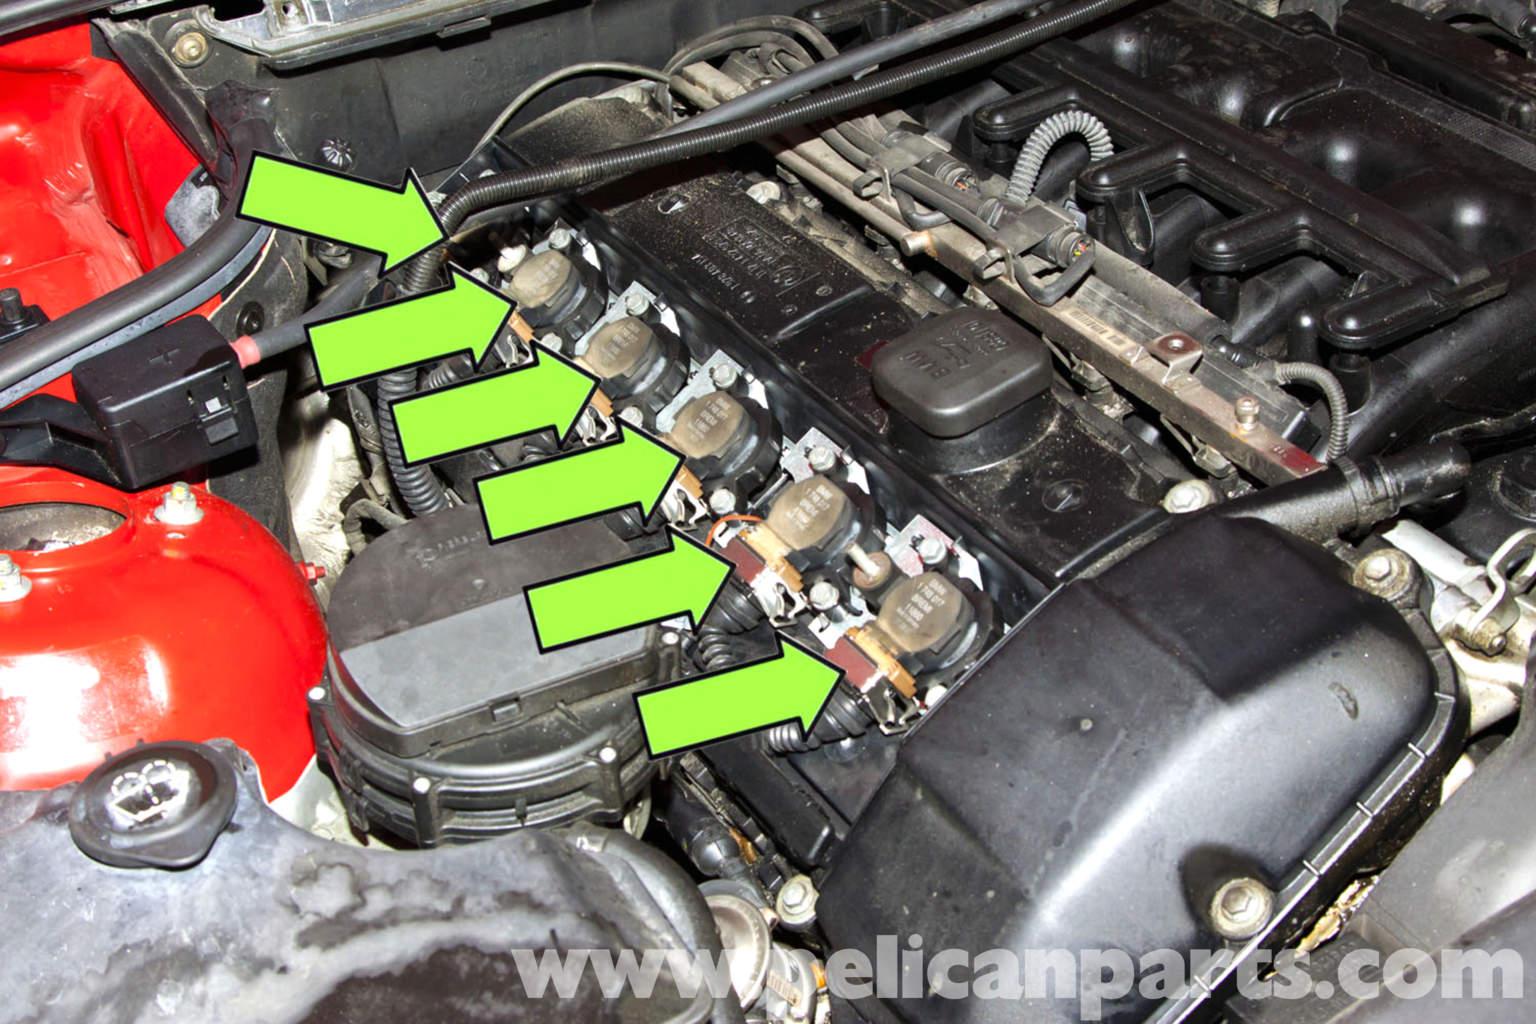 2006 bmw 325i engine diagram doerr motor lr22132 wiring 2001 525i compartment parts free